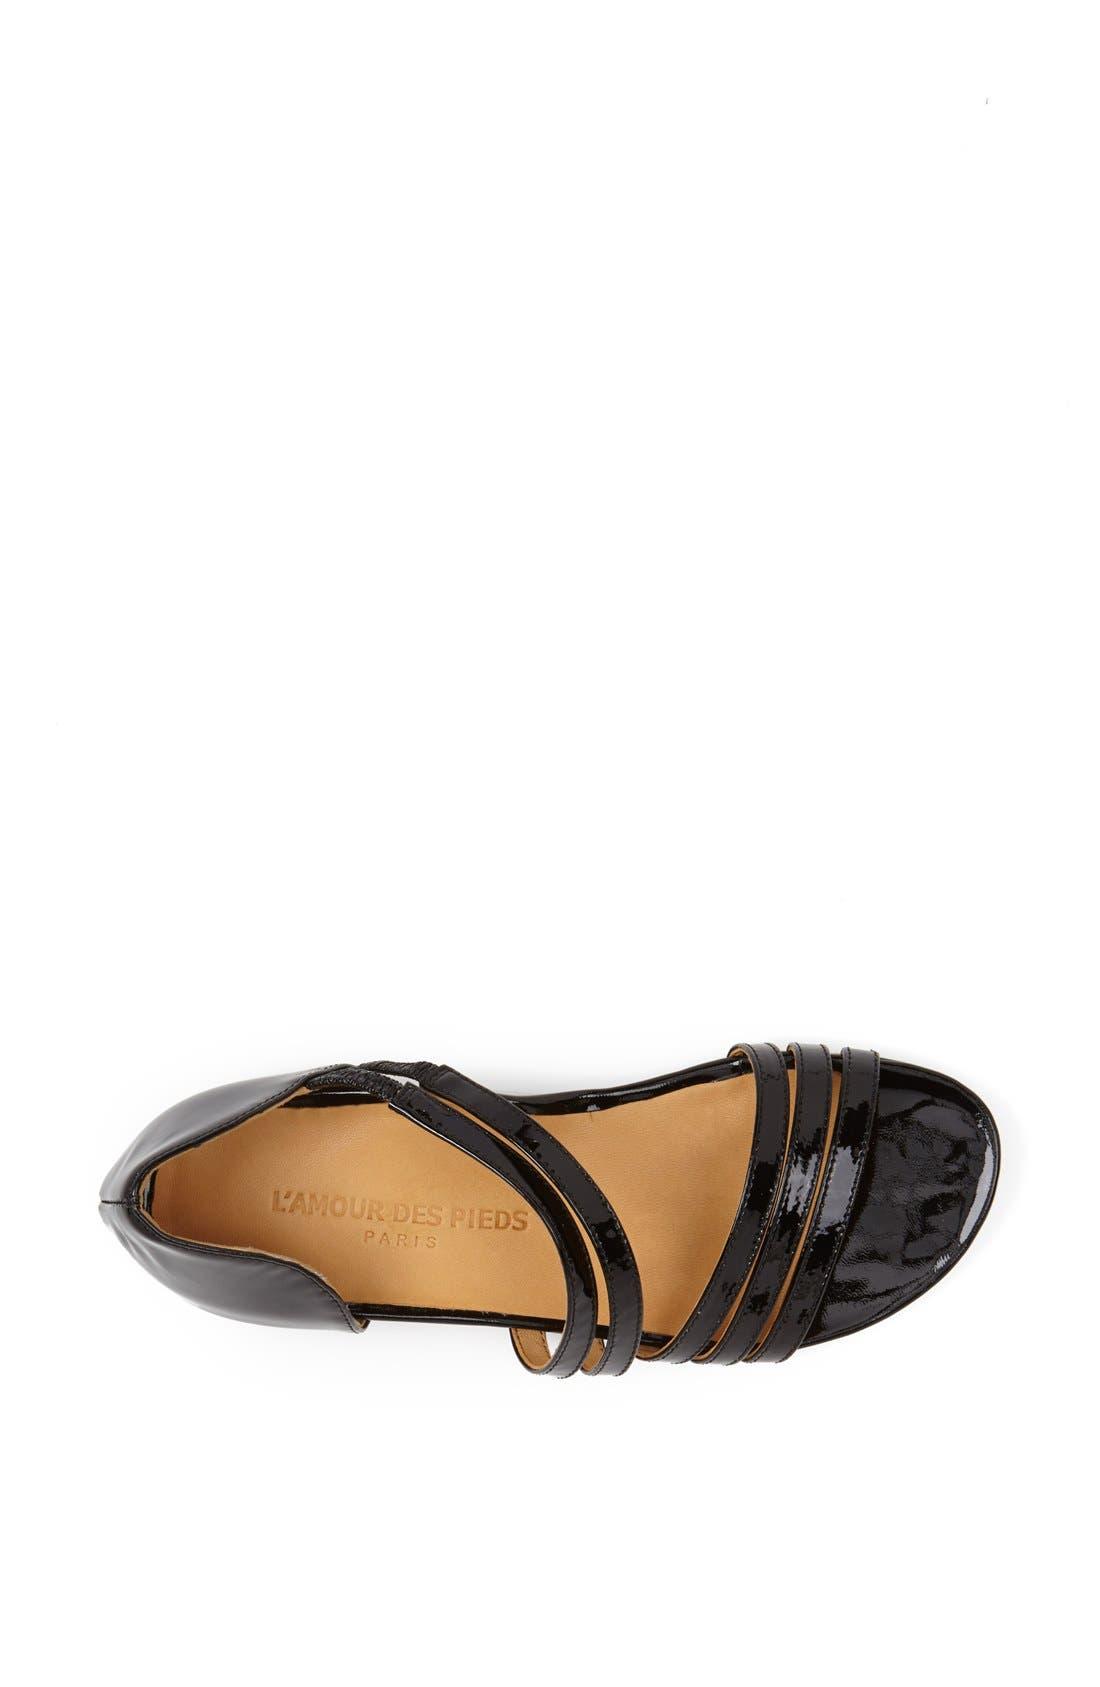 Alternate Image 3  - L'Amour des Pieds'Dolce' Sandal